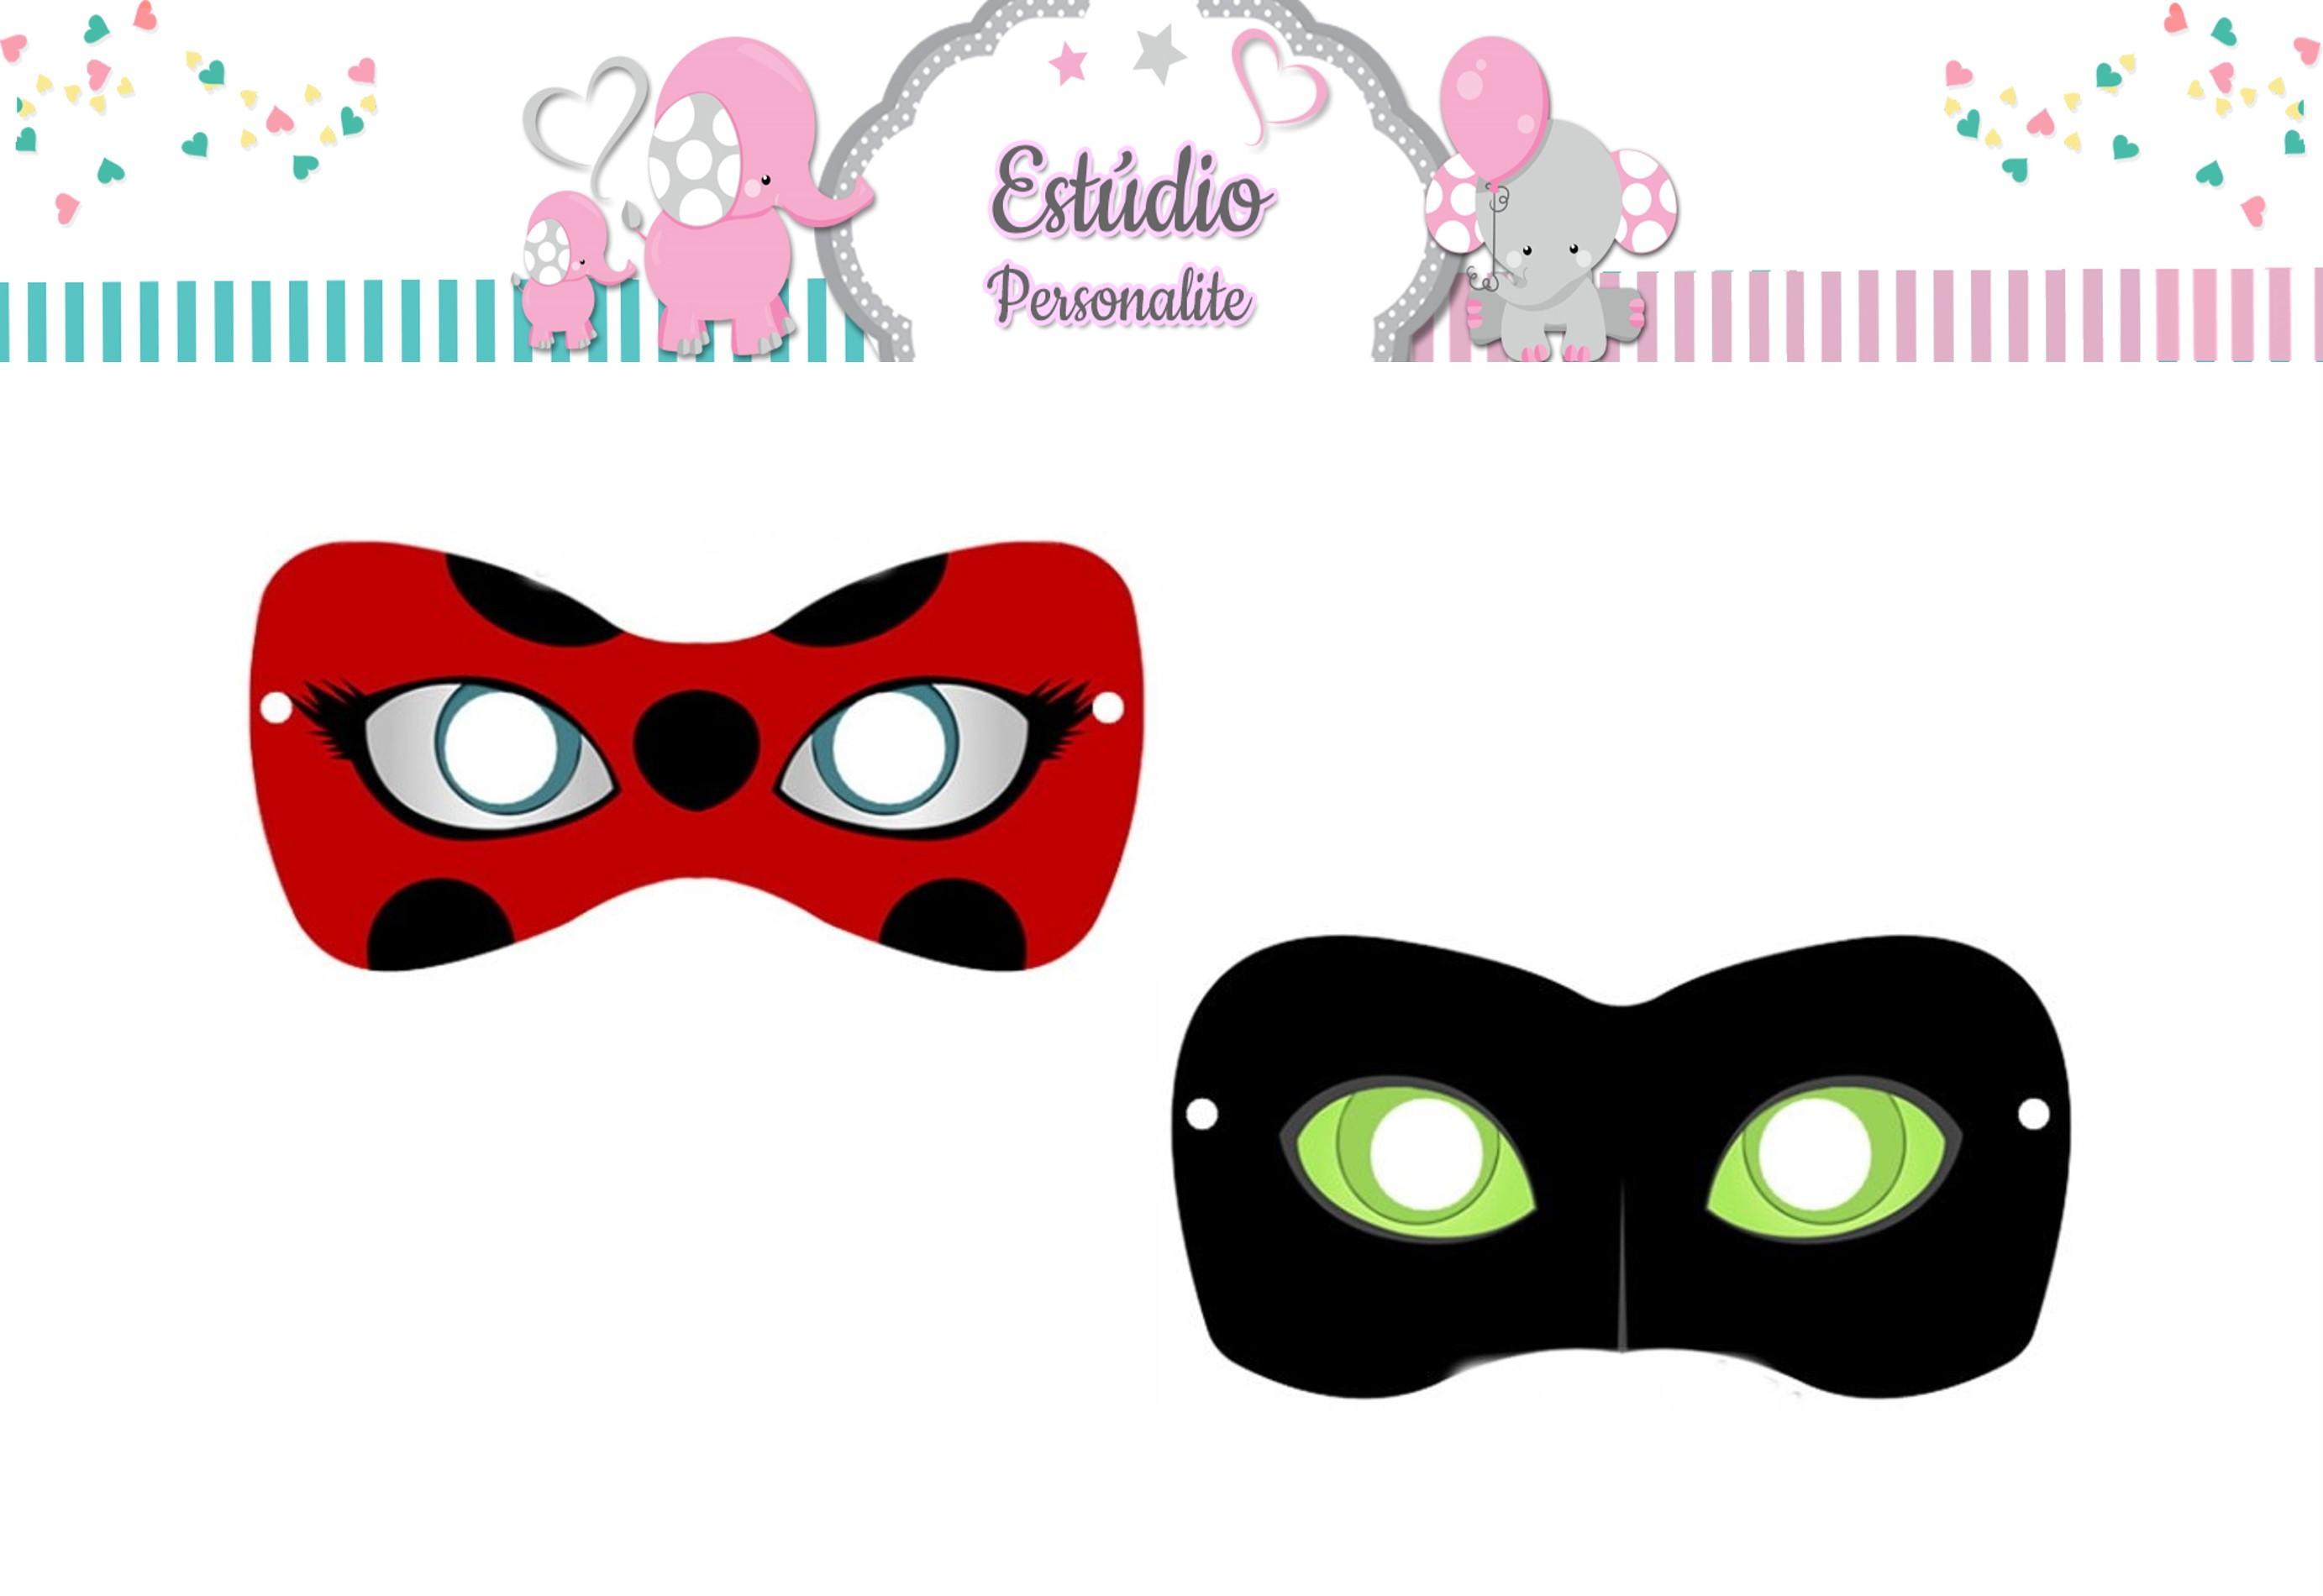 Mascaras Ladybug No Elo7 Estudio Personalite F4c0d6